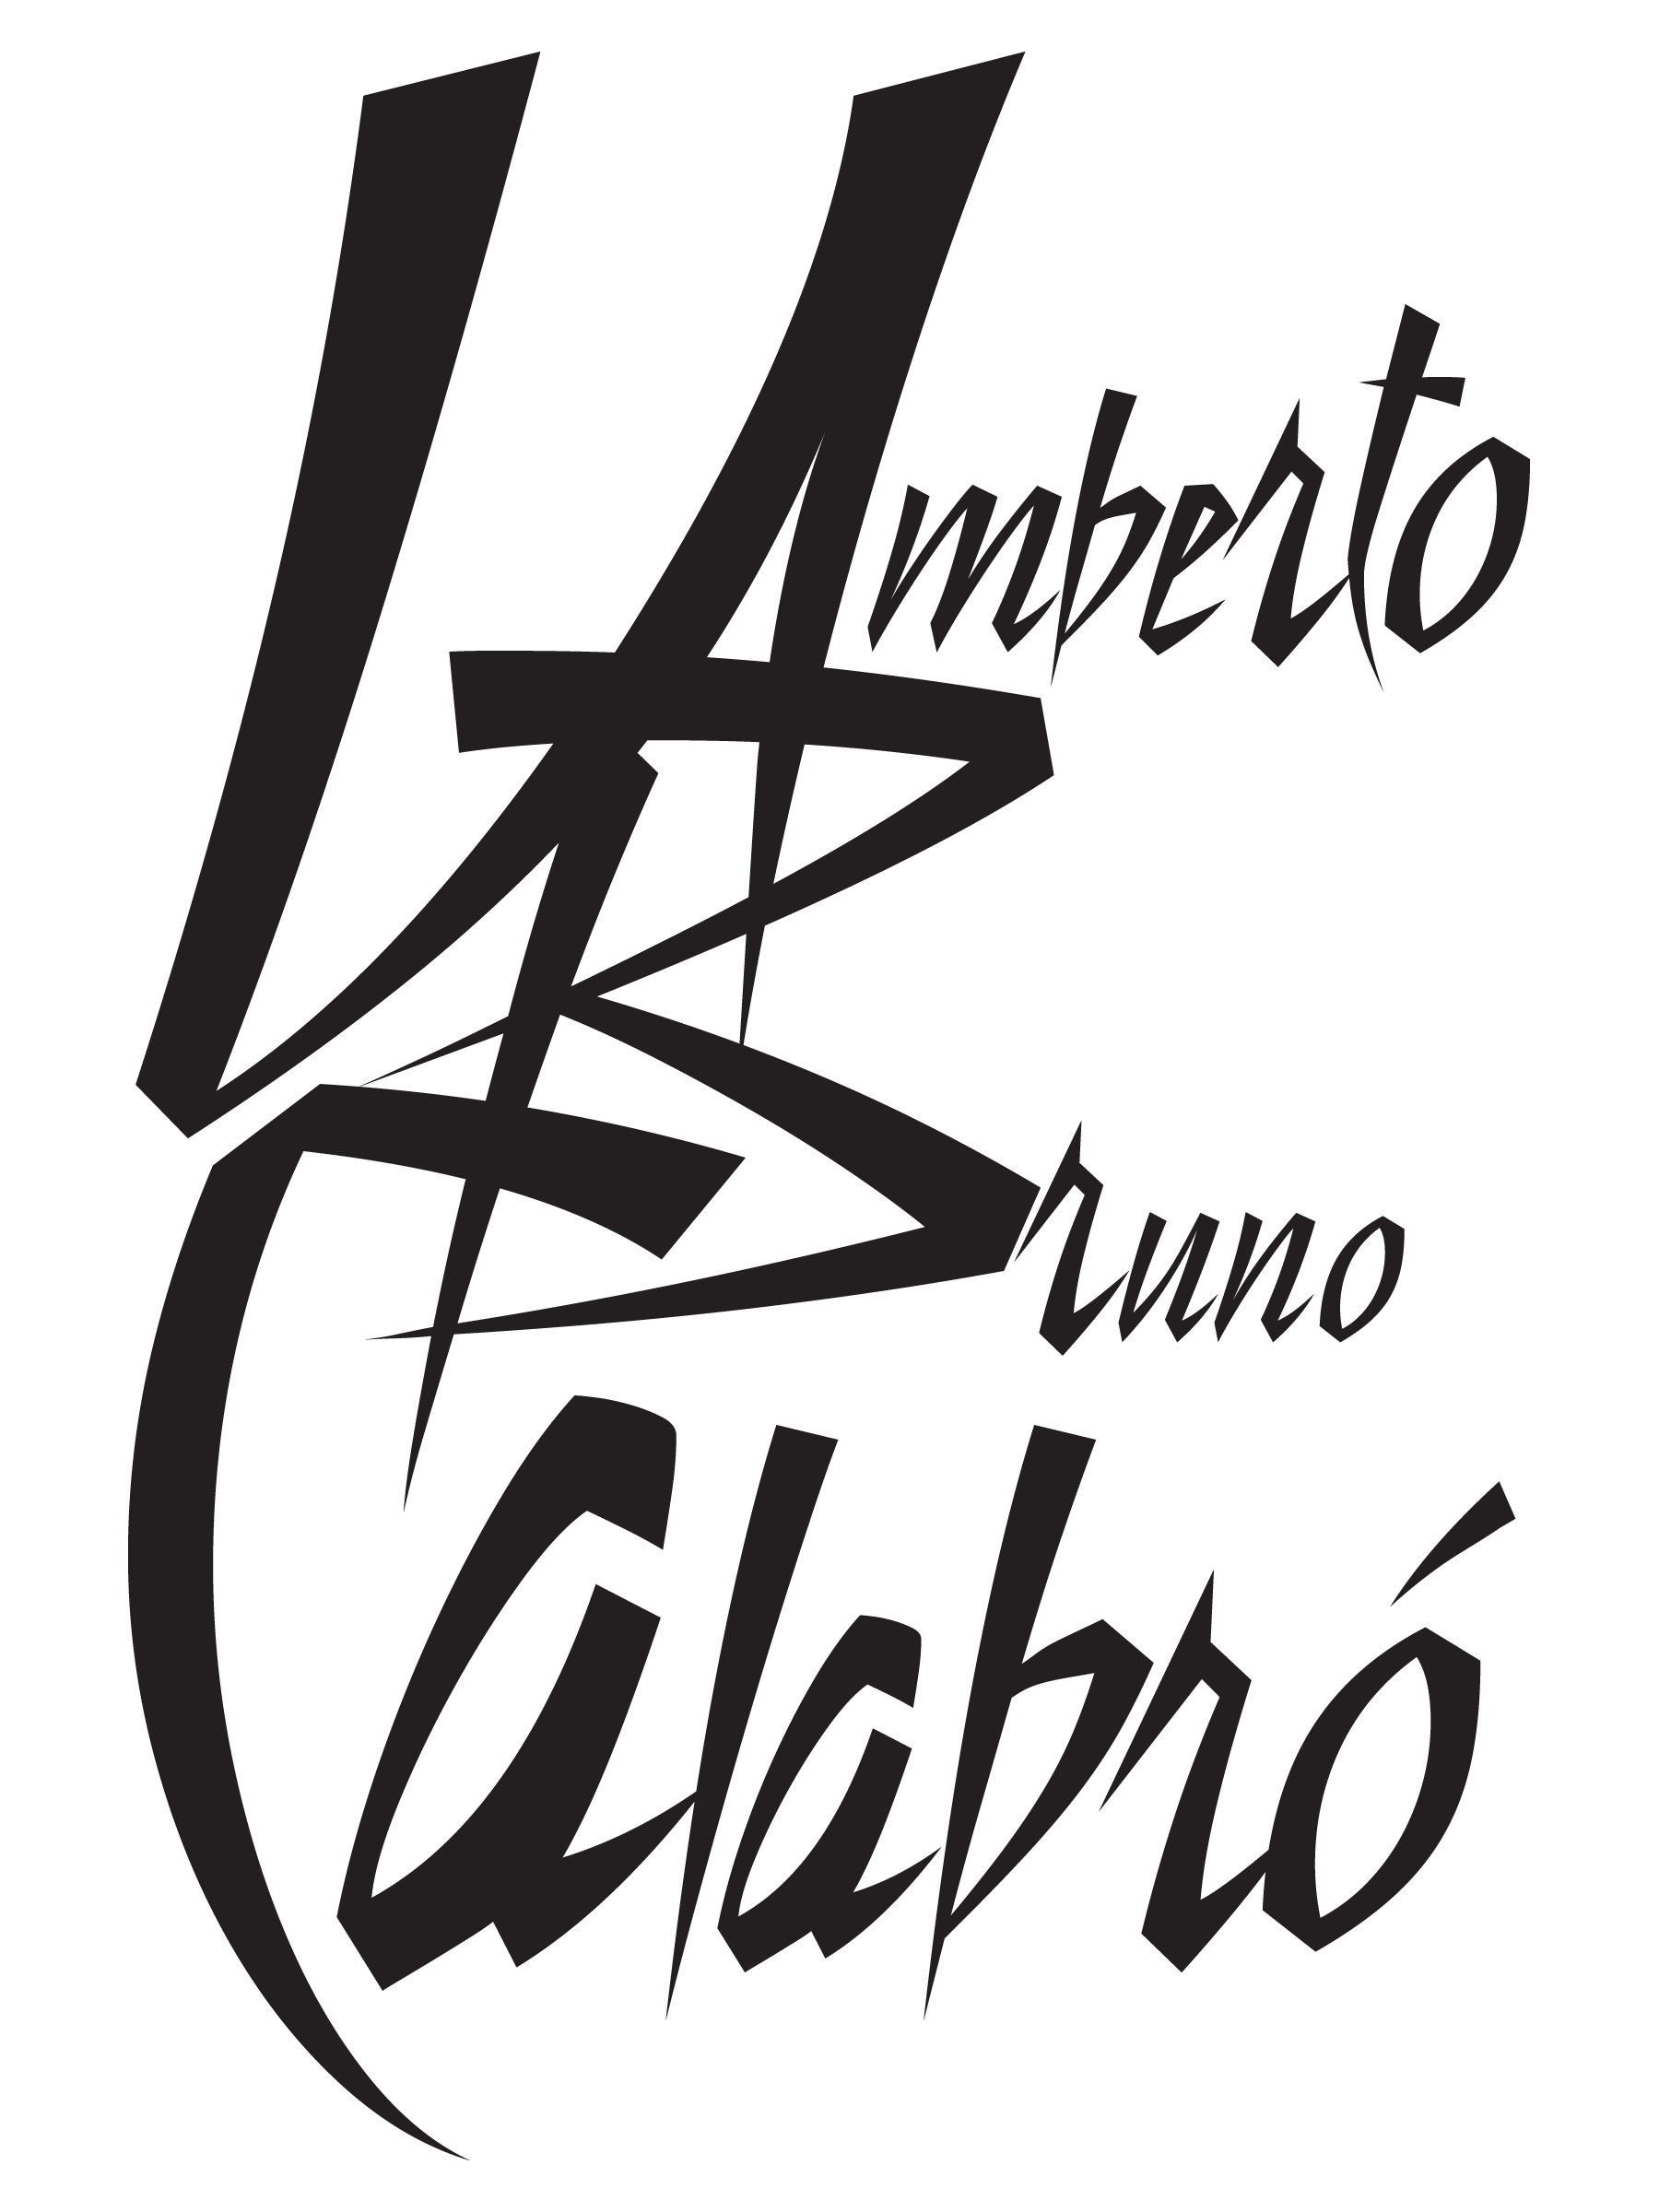 Logo Design for Umberto Bruno Calabro. Local New York